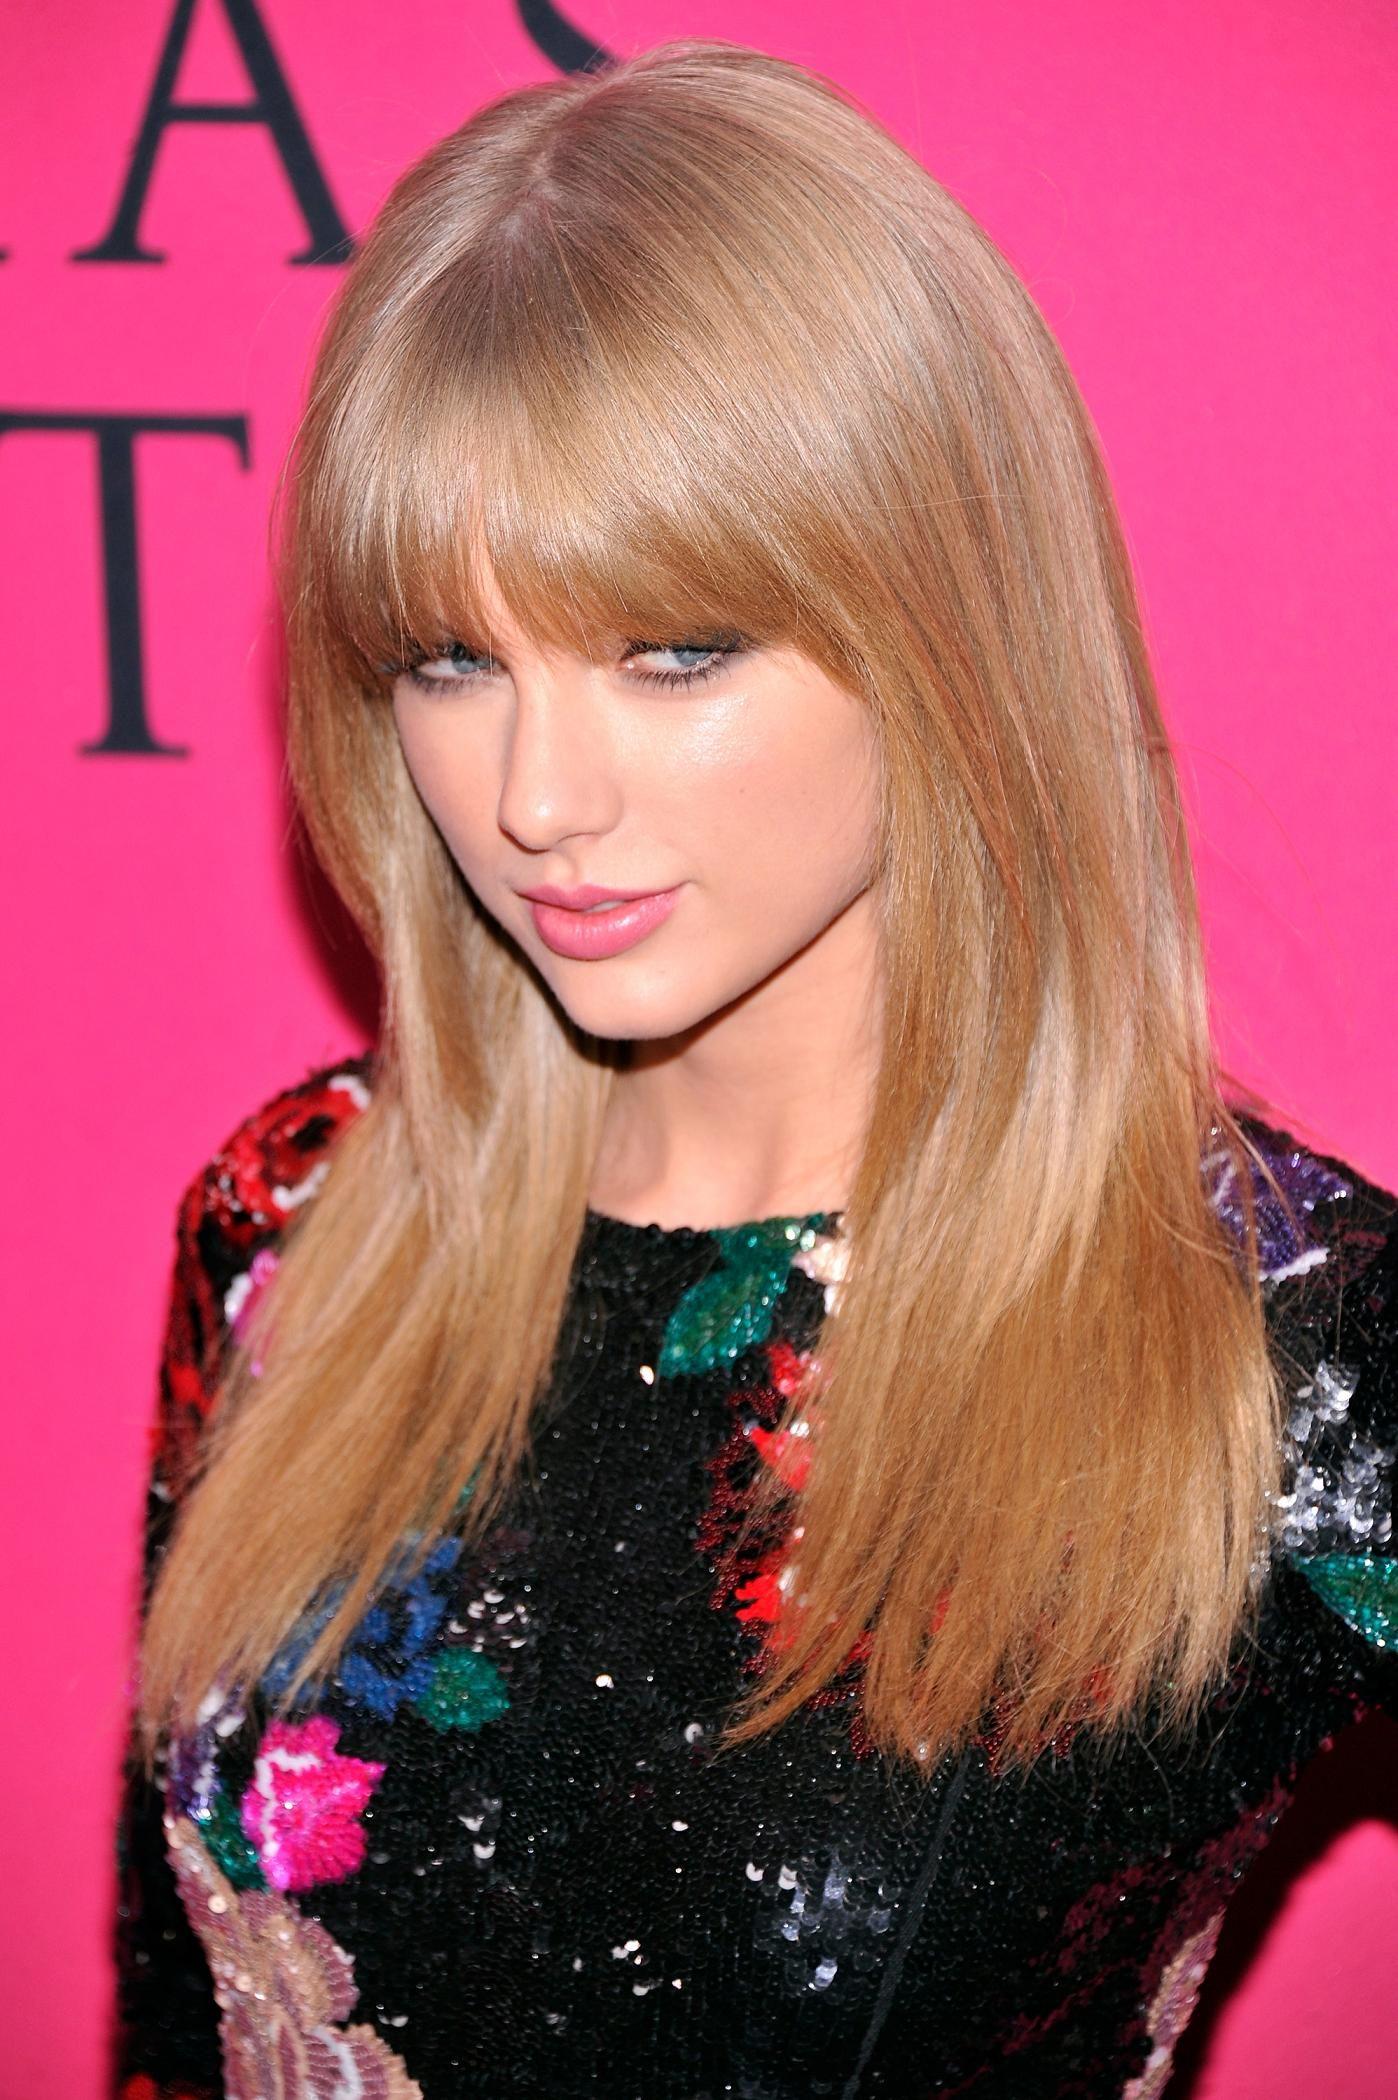 """ TAYLOR SWIFT "" – Super Cute n Super Leggy @ 2013 Victoria's Secret Fashion Show."